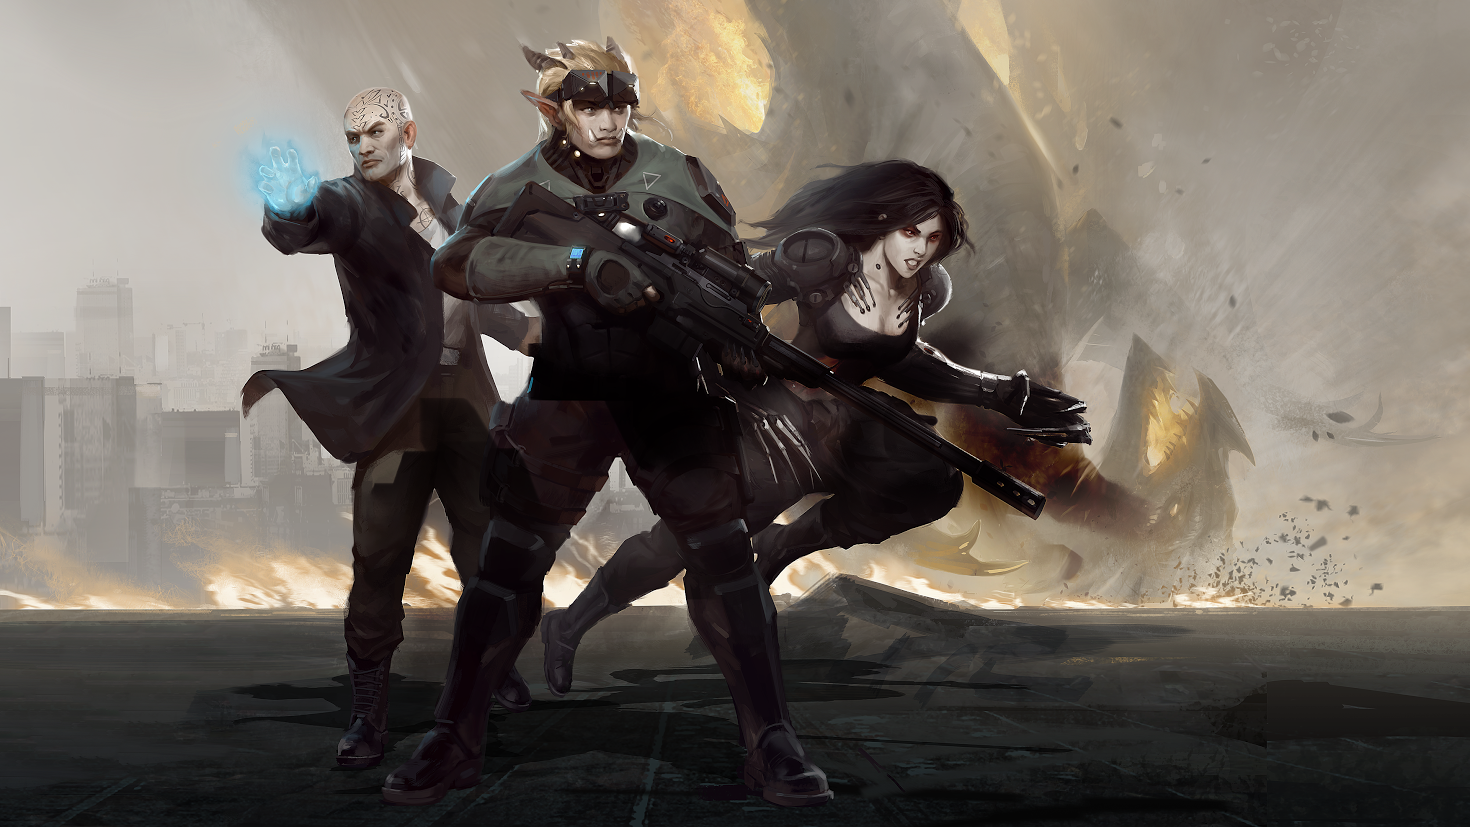 Get the definitive cyberpunk RPG experience in Shadowrun: Dragonfall – Director's Cut